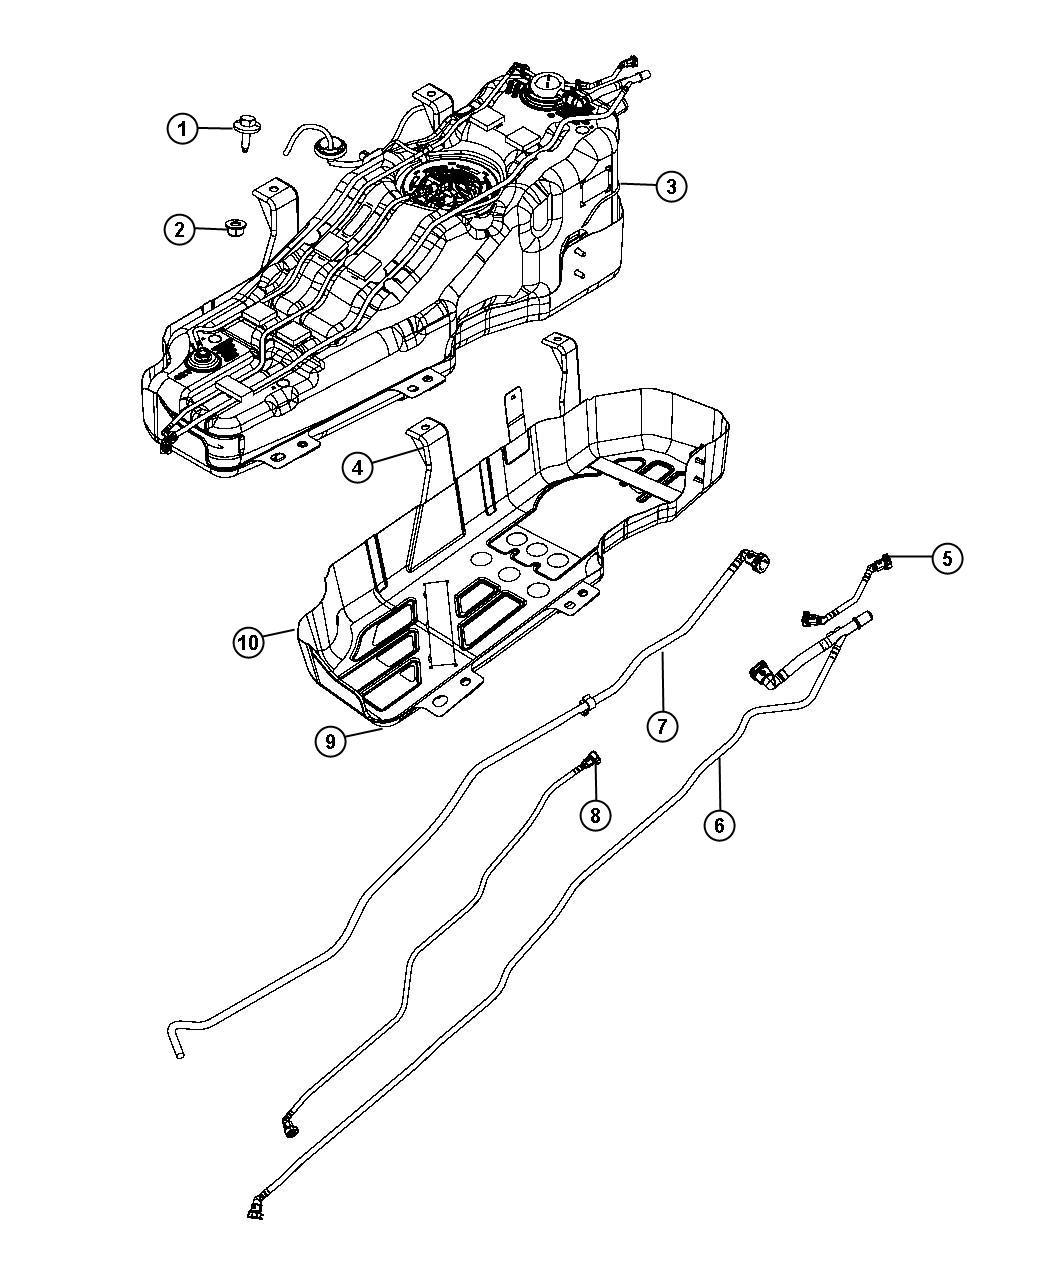 Jeep Liberty Wiring. Fuel tank. Gallon, plate, skid